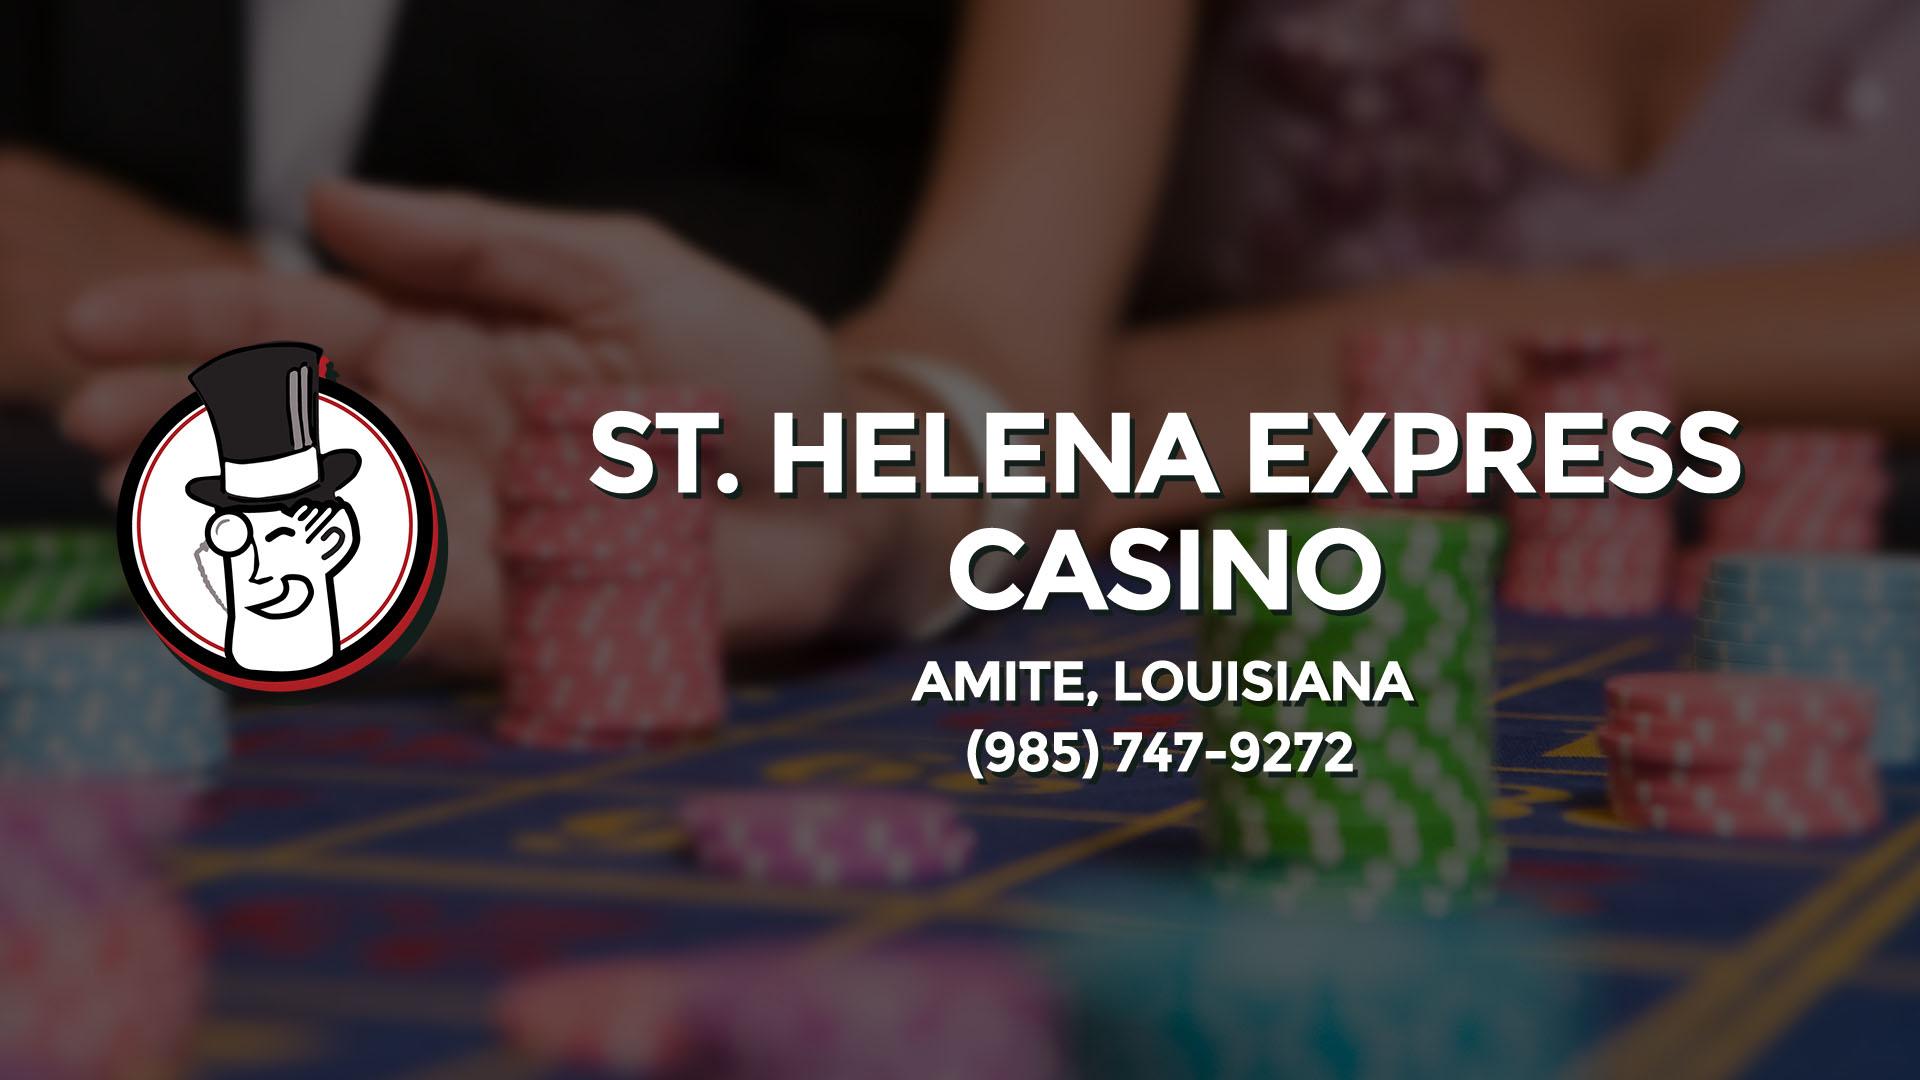 ST HELENA EXPRESS CASINO AMITE LA